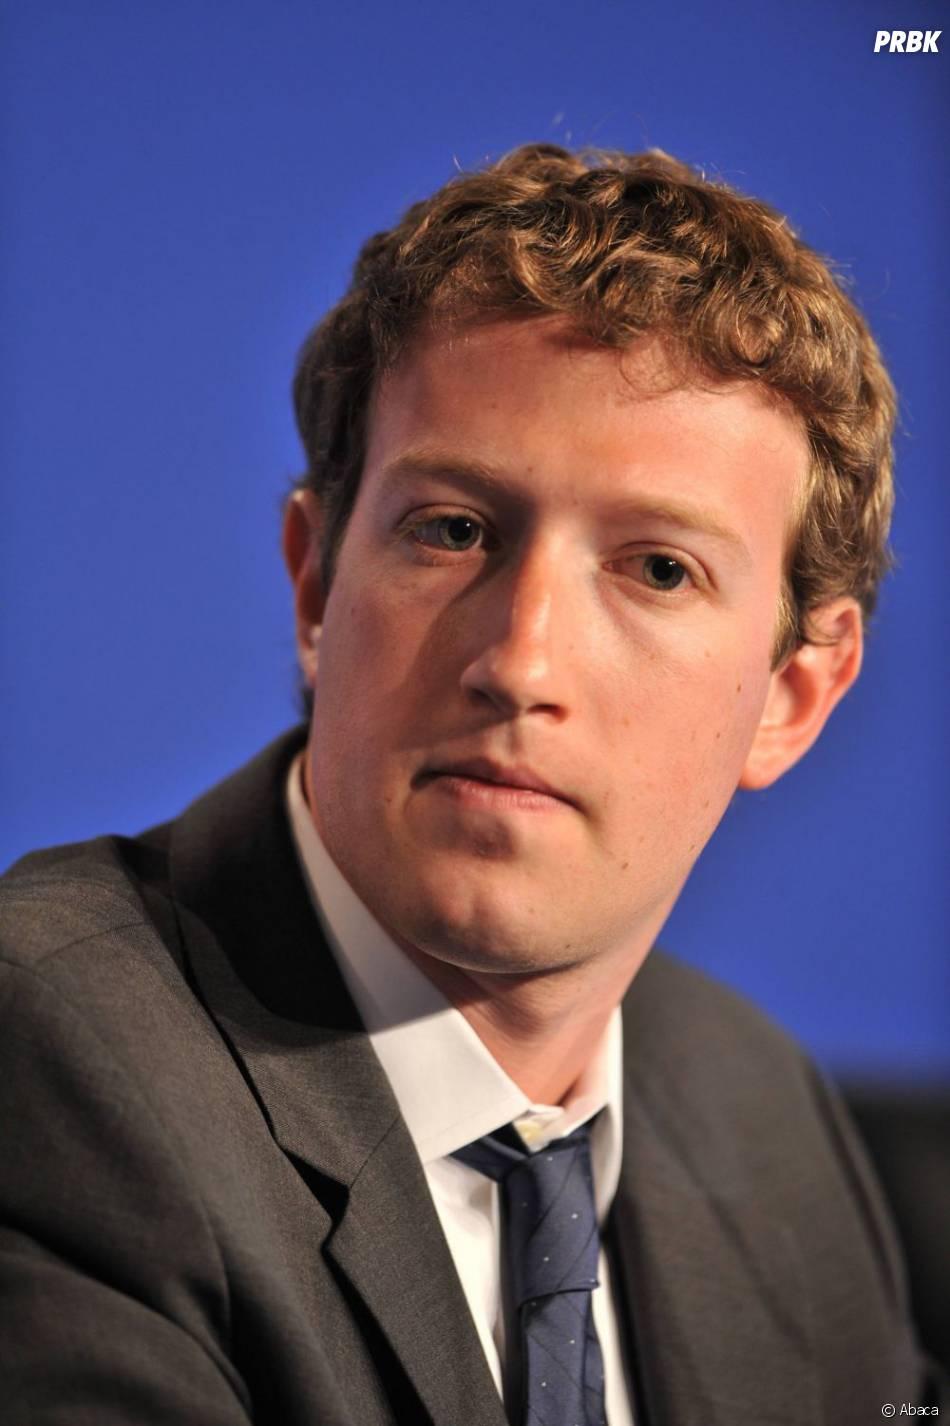 Mark Zuckerberg a permis à un français de retrouver sa fille